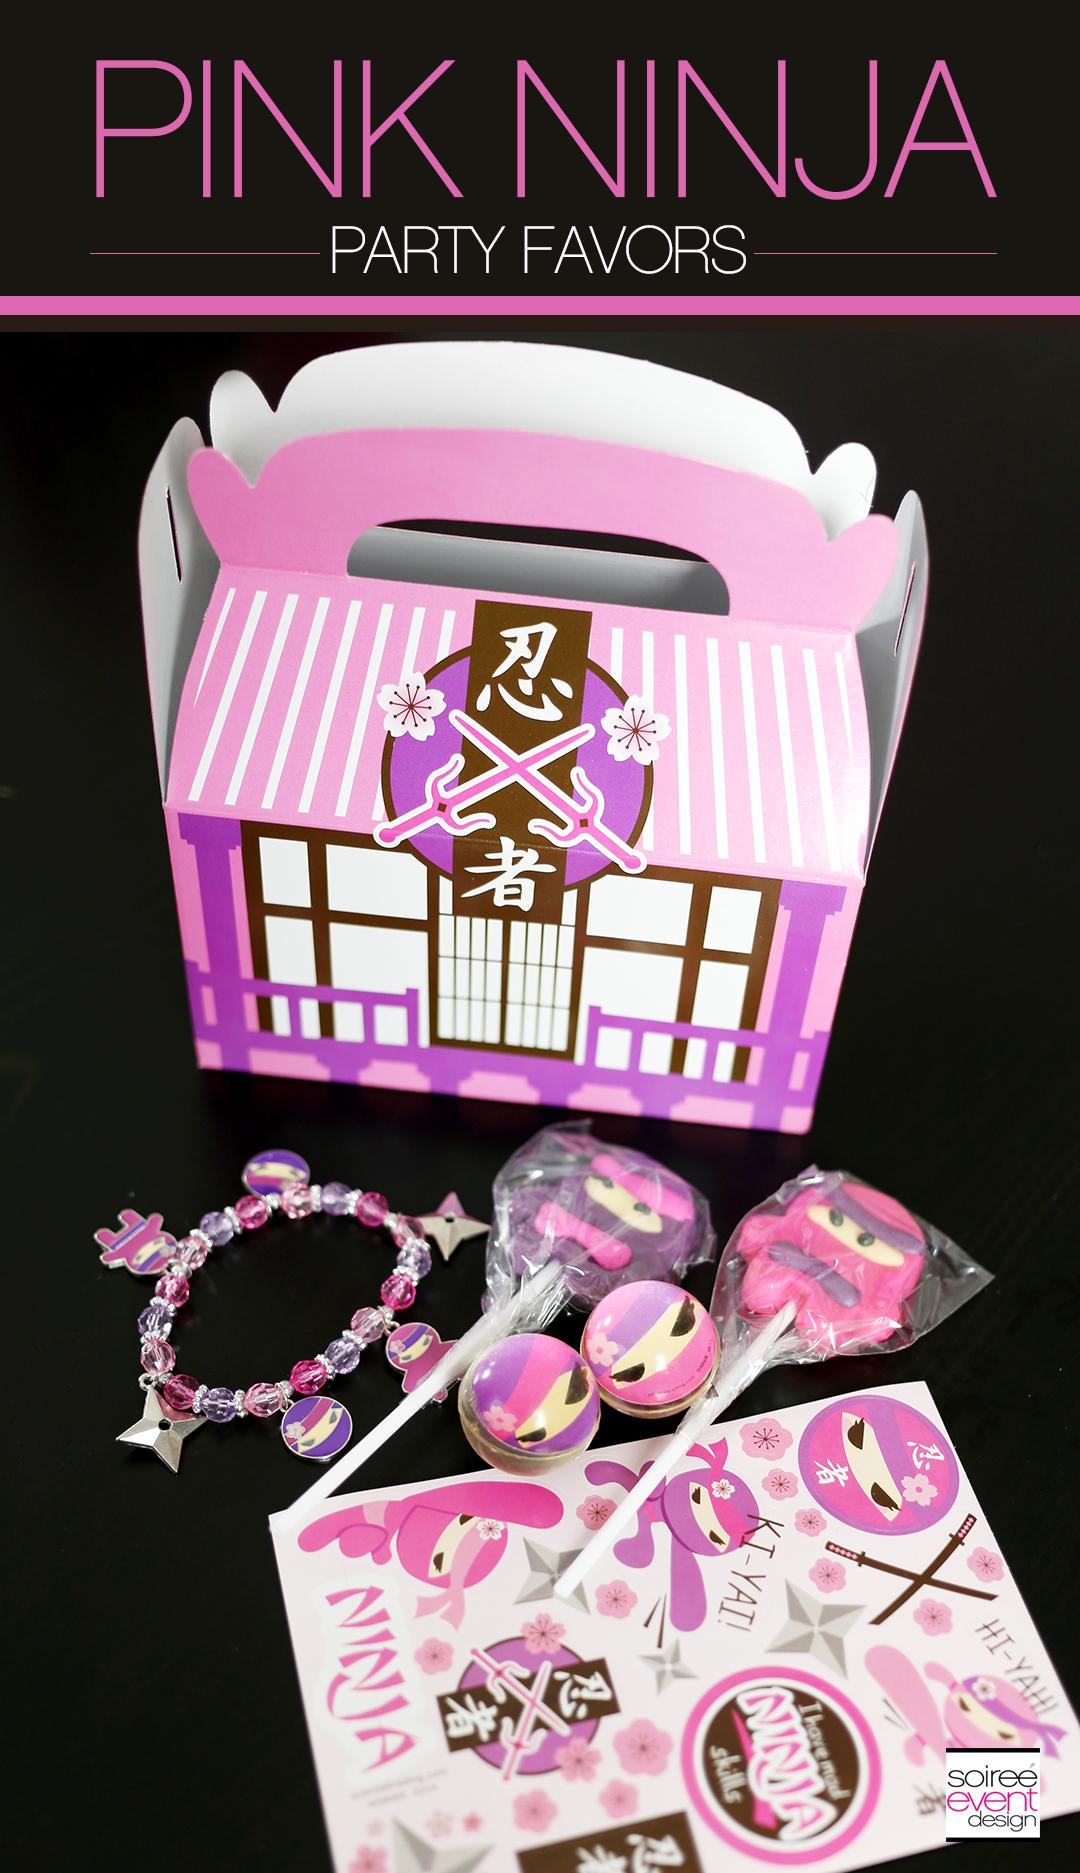 Pink Ninja Party Favors